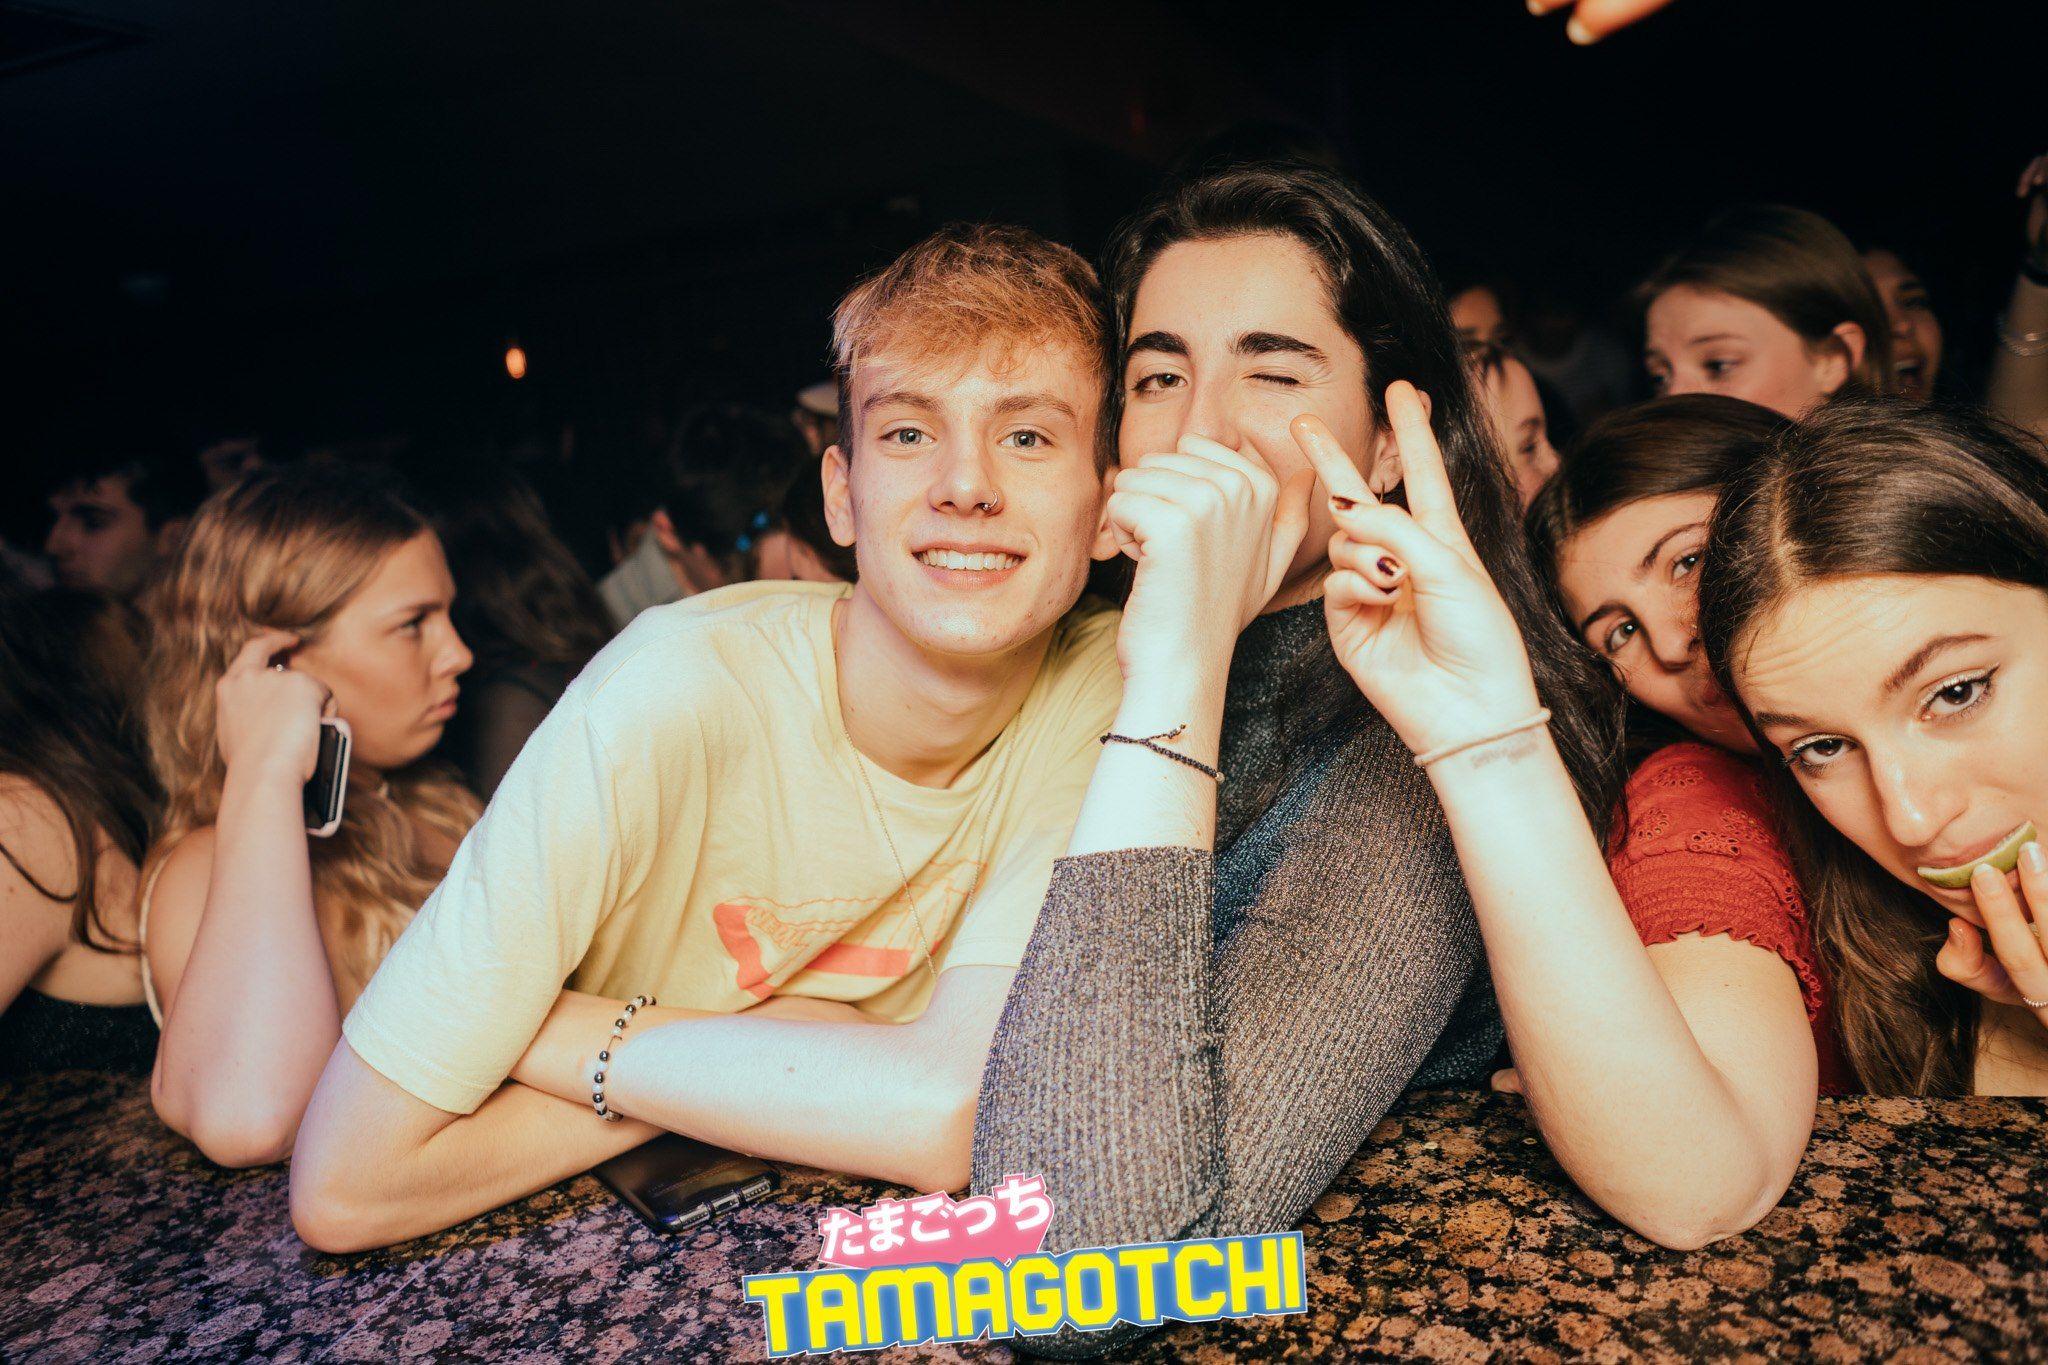 Image may contain: Night Life, Night Club, Club, Person, Human